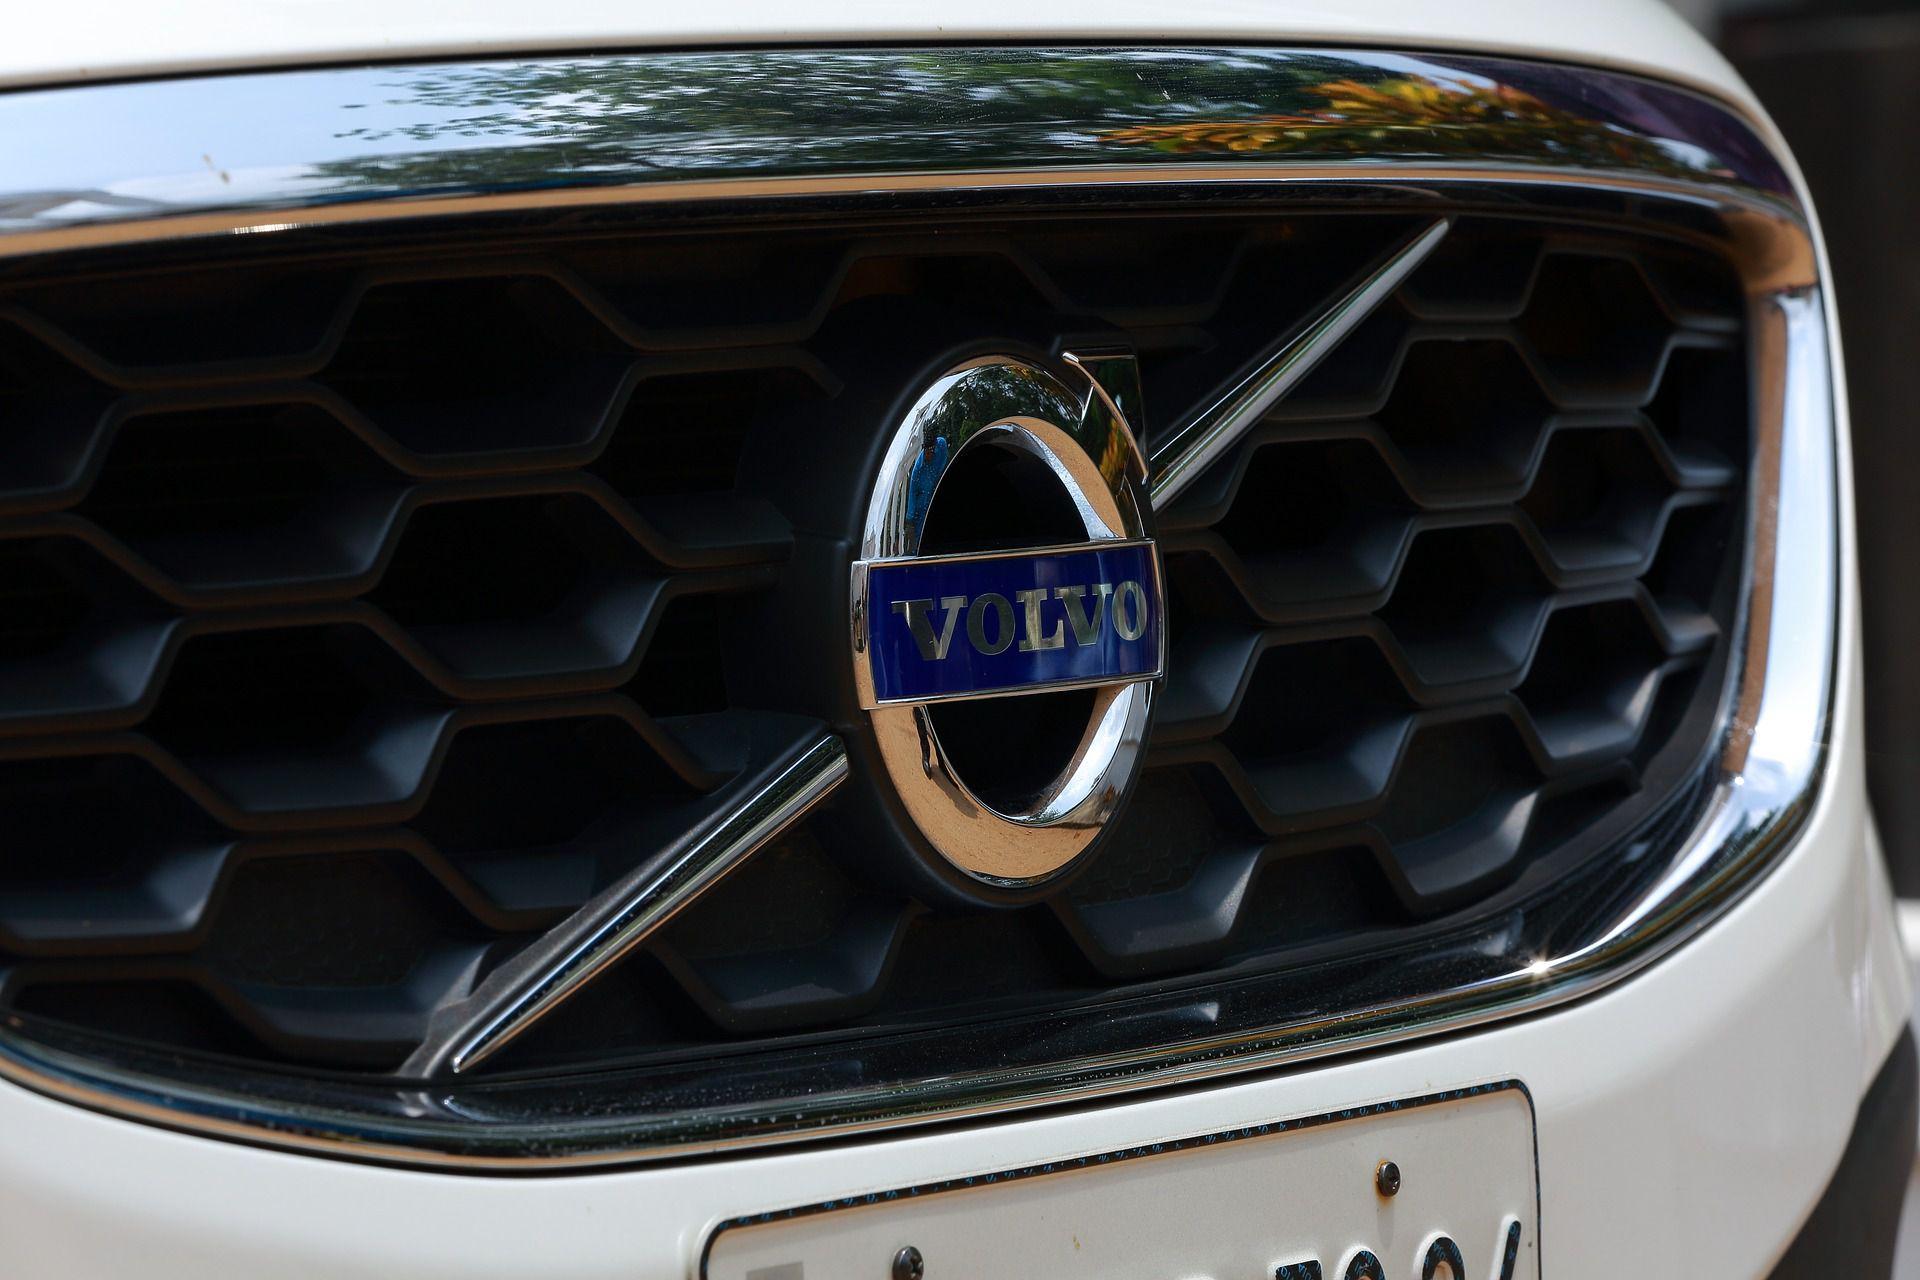 Best Mechanic Shop - Larry's Independent Volvo Service